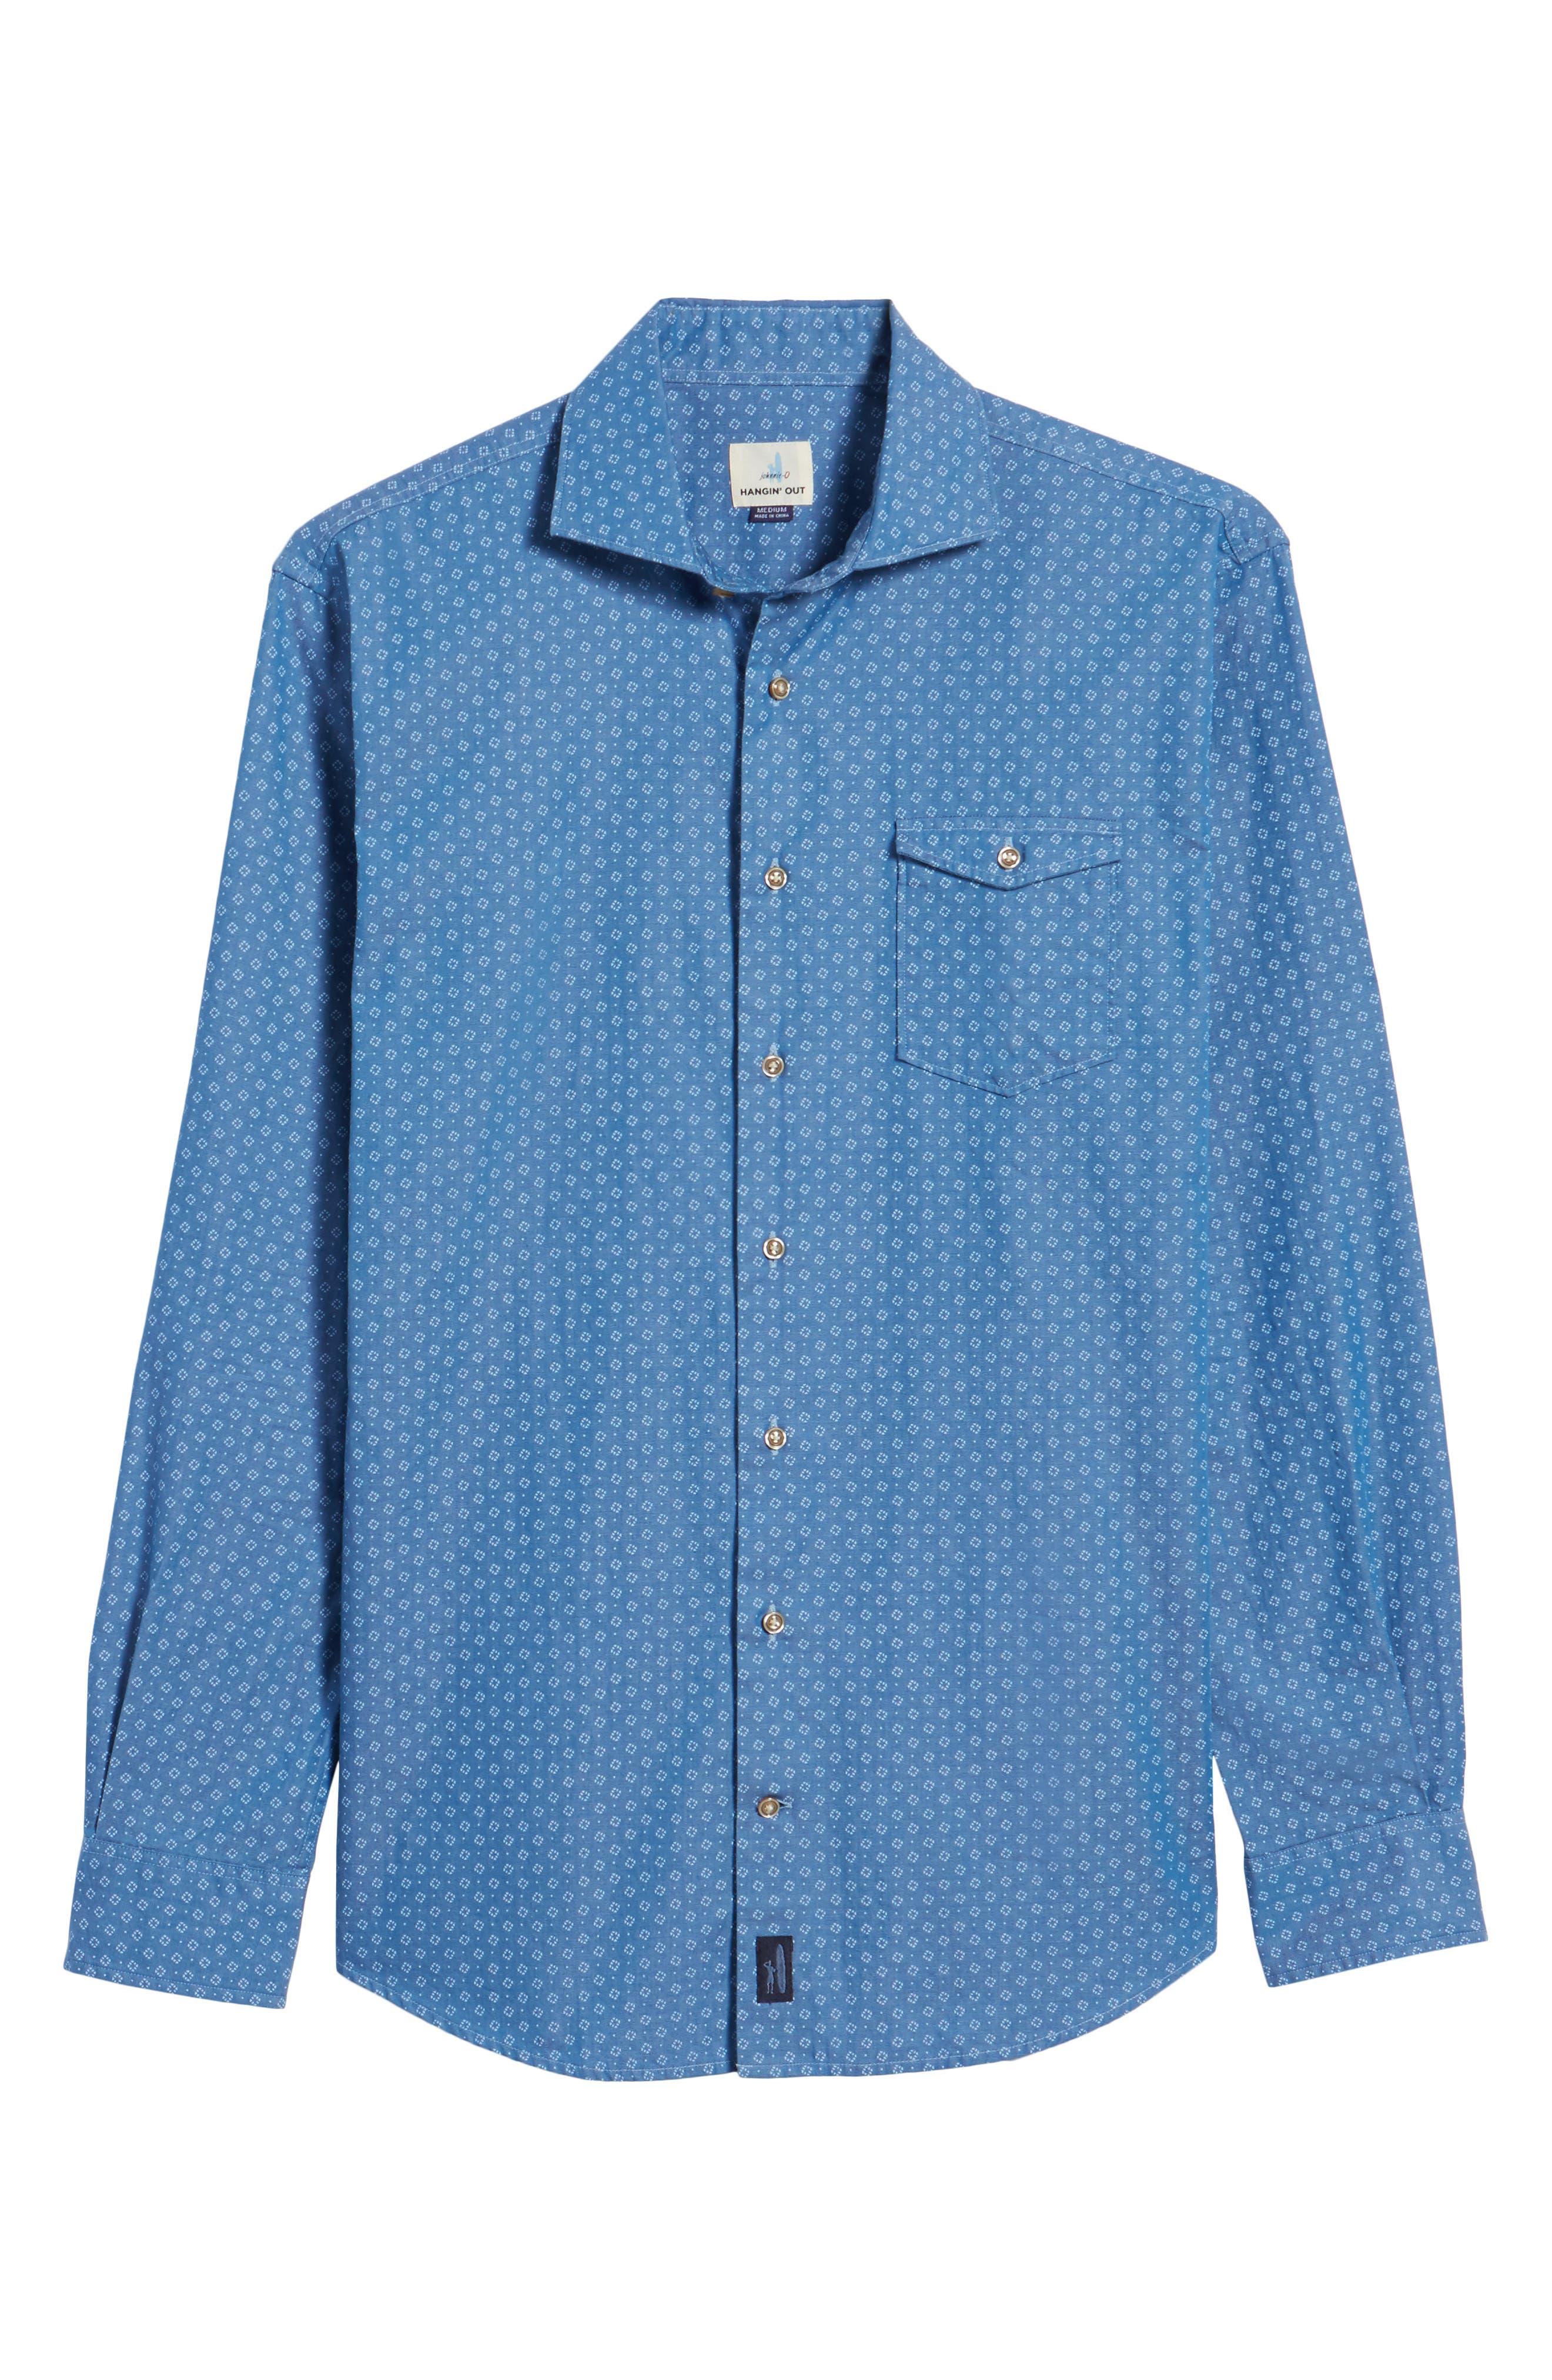 Barclay Regular Fit Sport Shirt,                             Alternate thumbnail 6, color,                             250